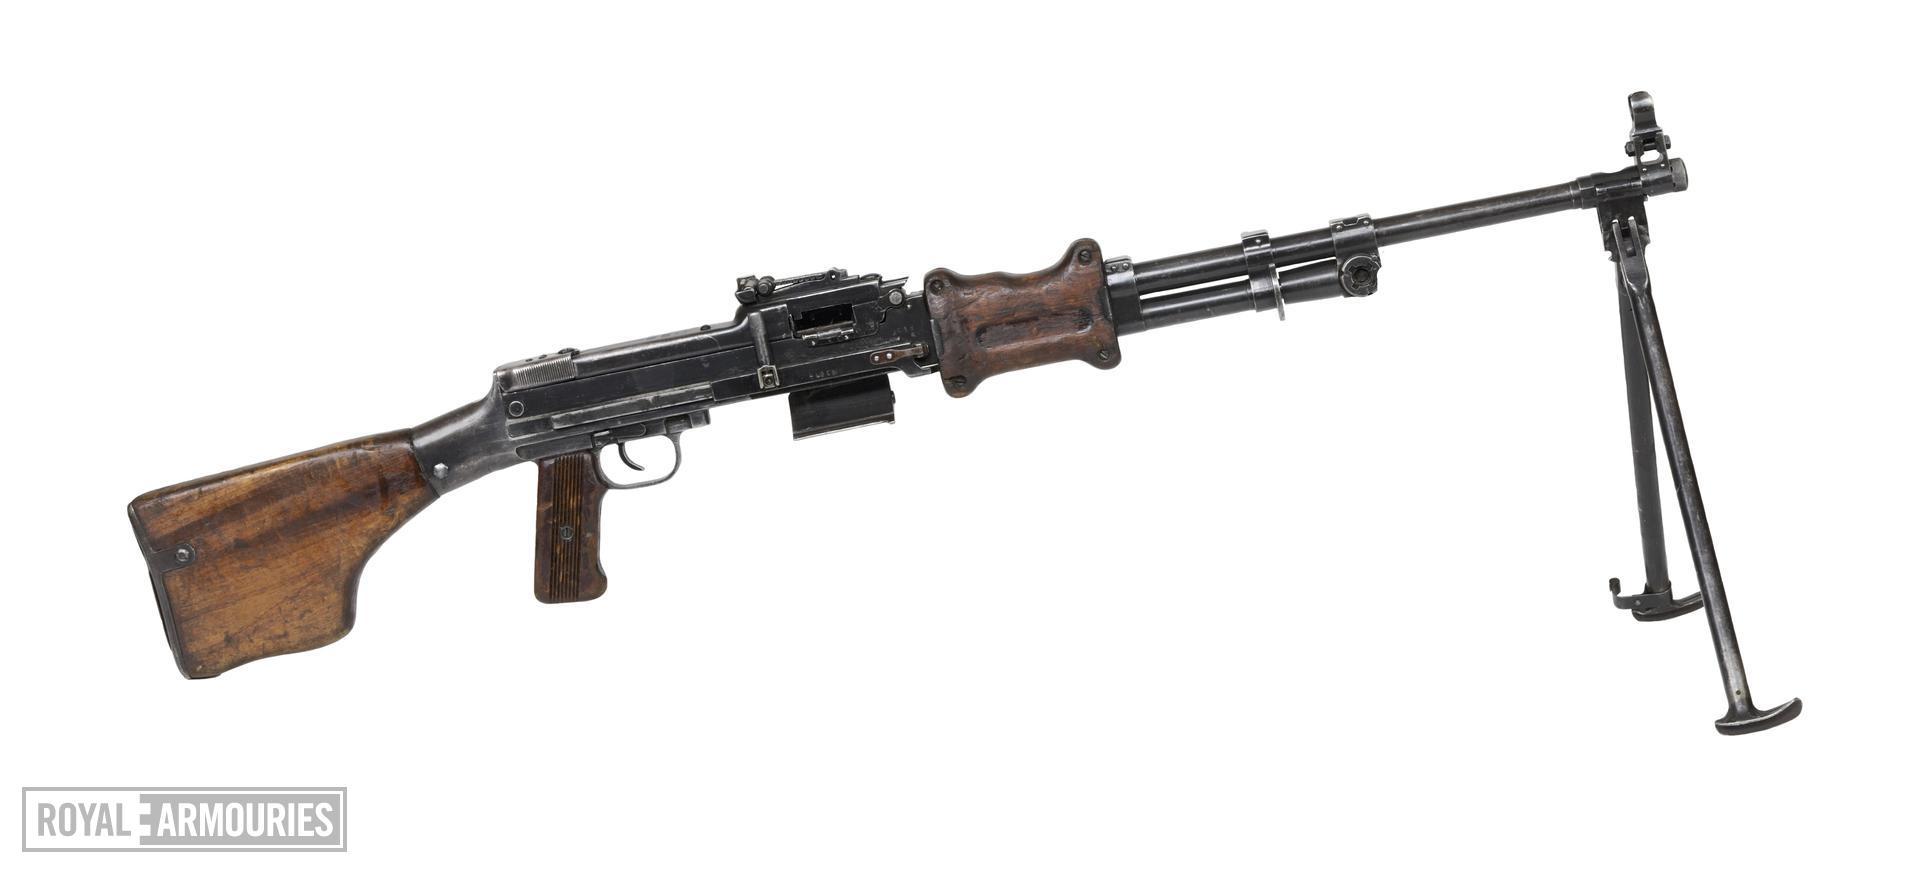 Centrefire automatic light machine gun - Degtyarev Type 62 (RPD)